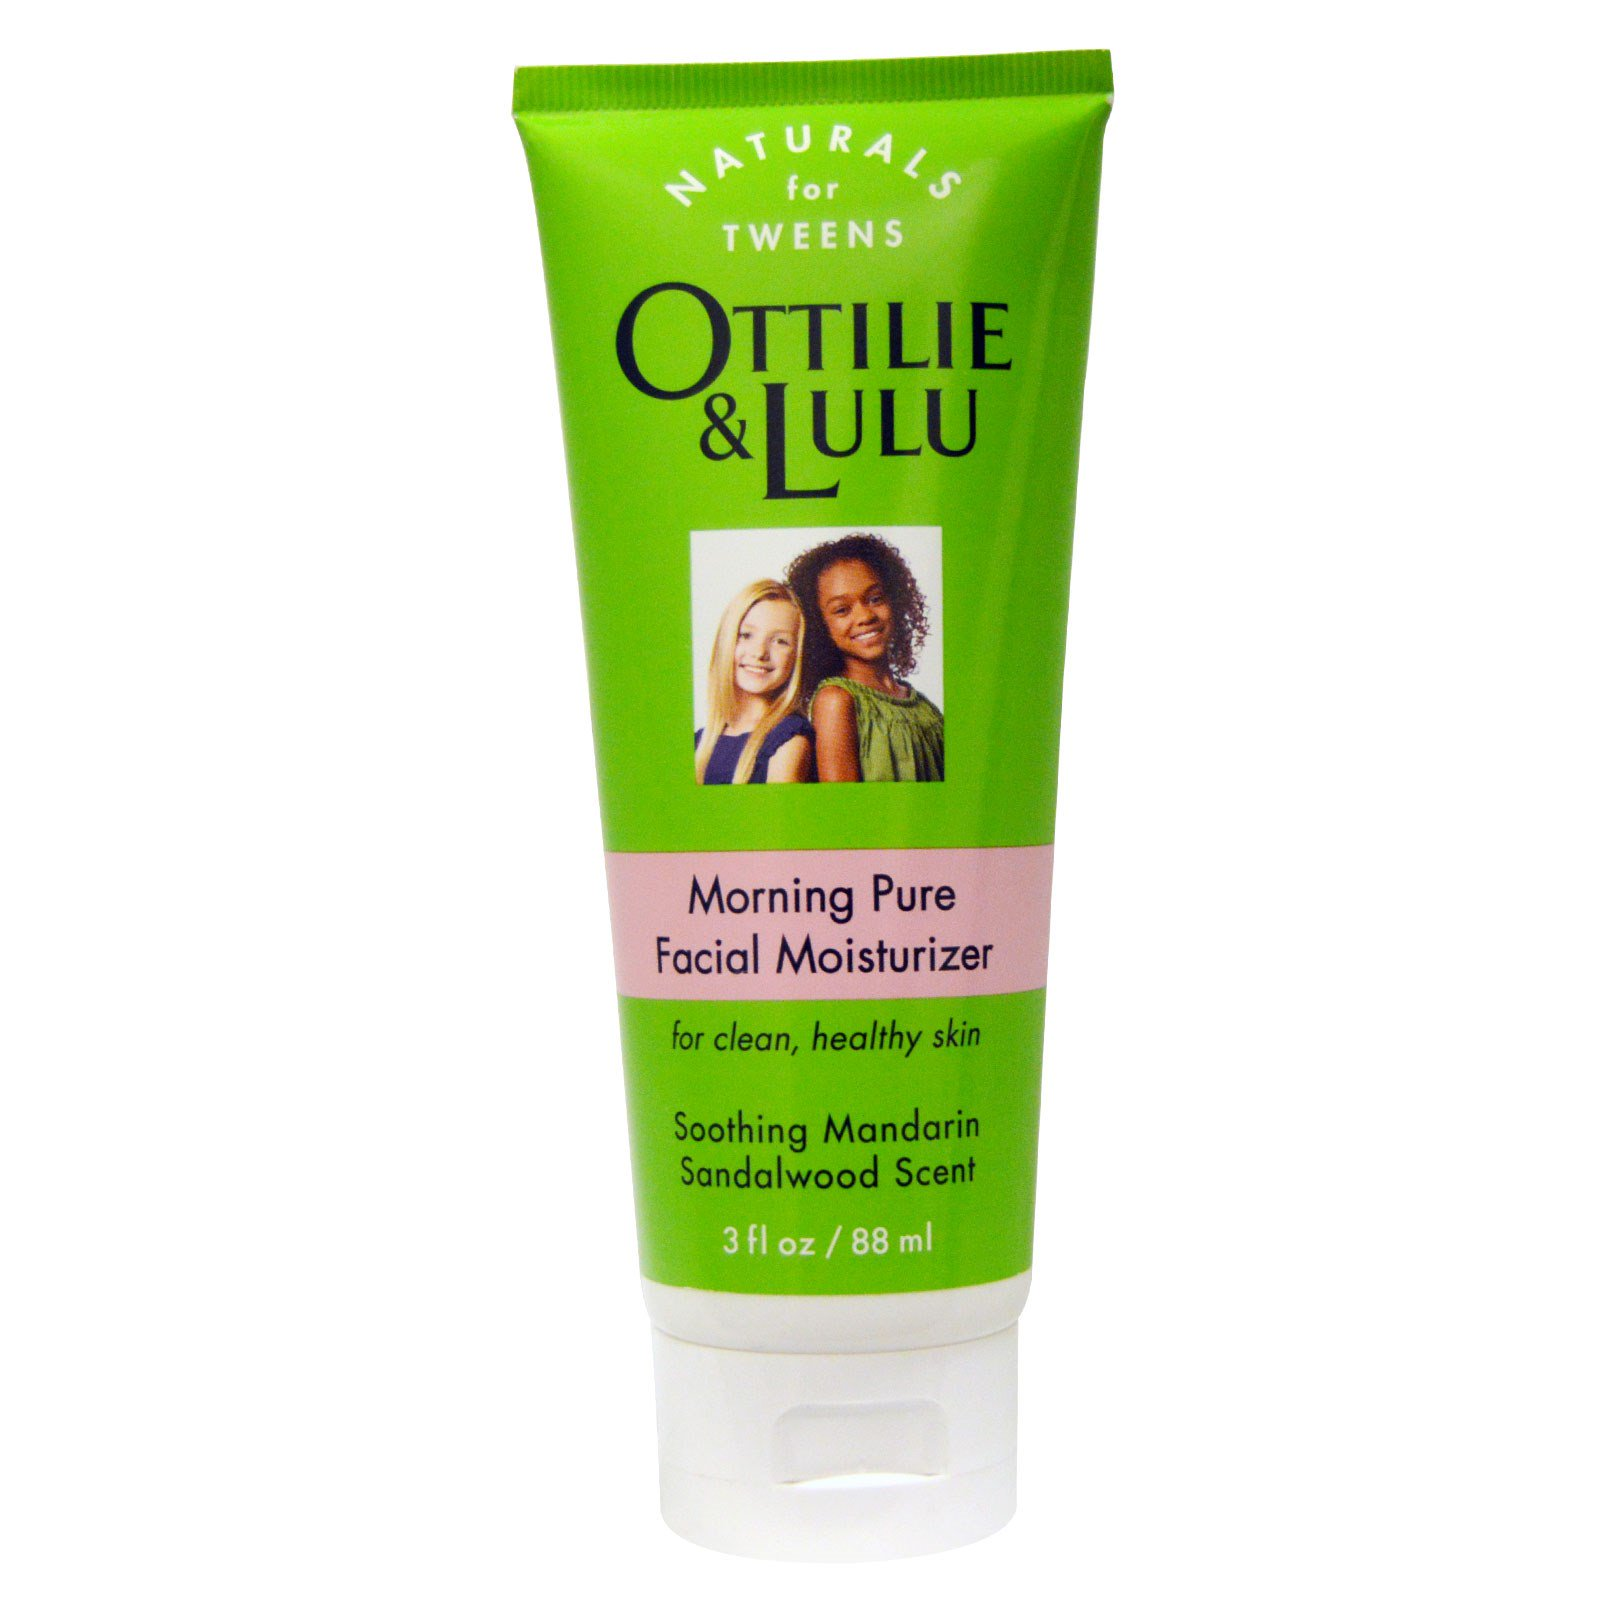 Ottilie Lulu, Morning Pure, увлажняющий крем для лица, с ароматом мандарина и сандала 3 жидких унций (88 мл)